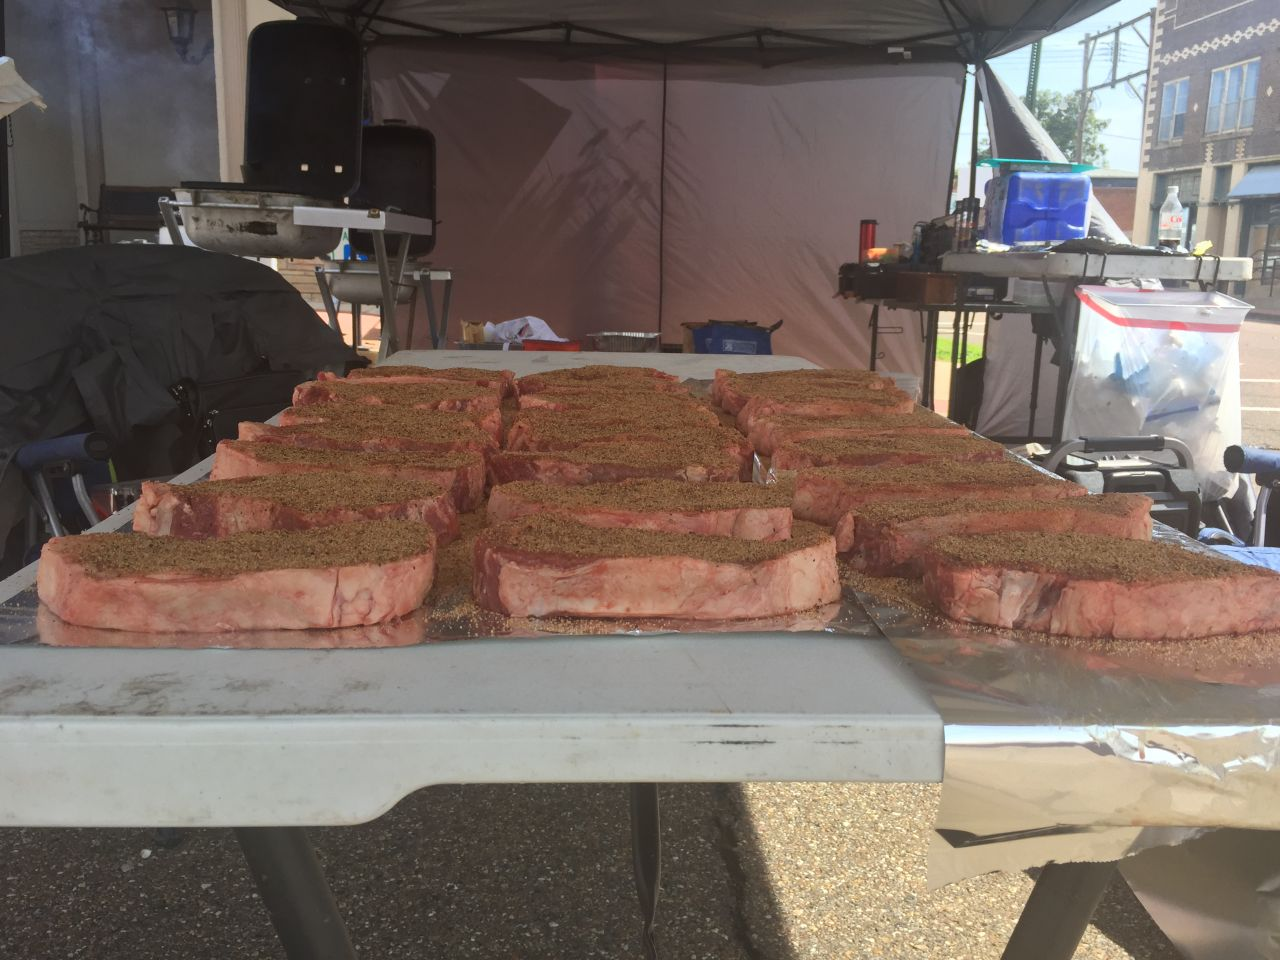 Exploring Arkansas Magnolia World Championship Steak Cook Off